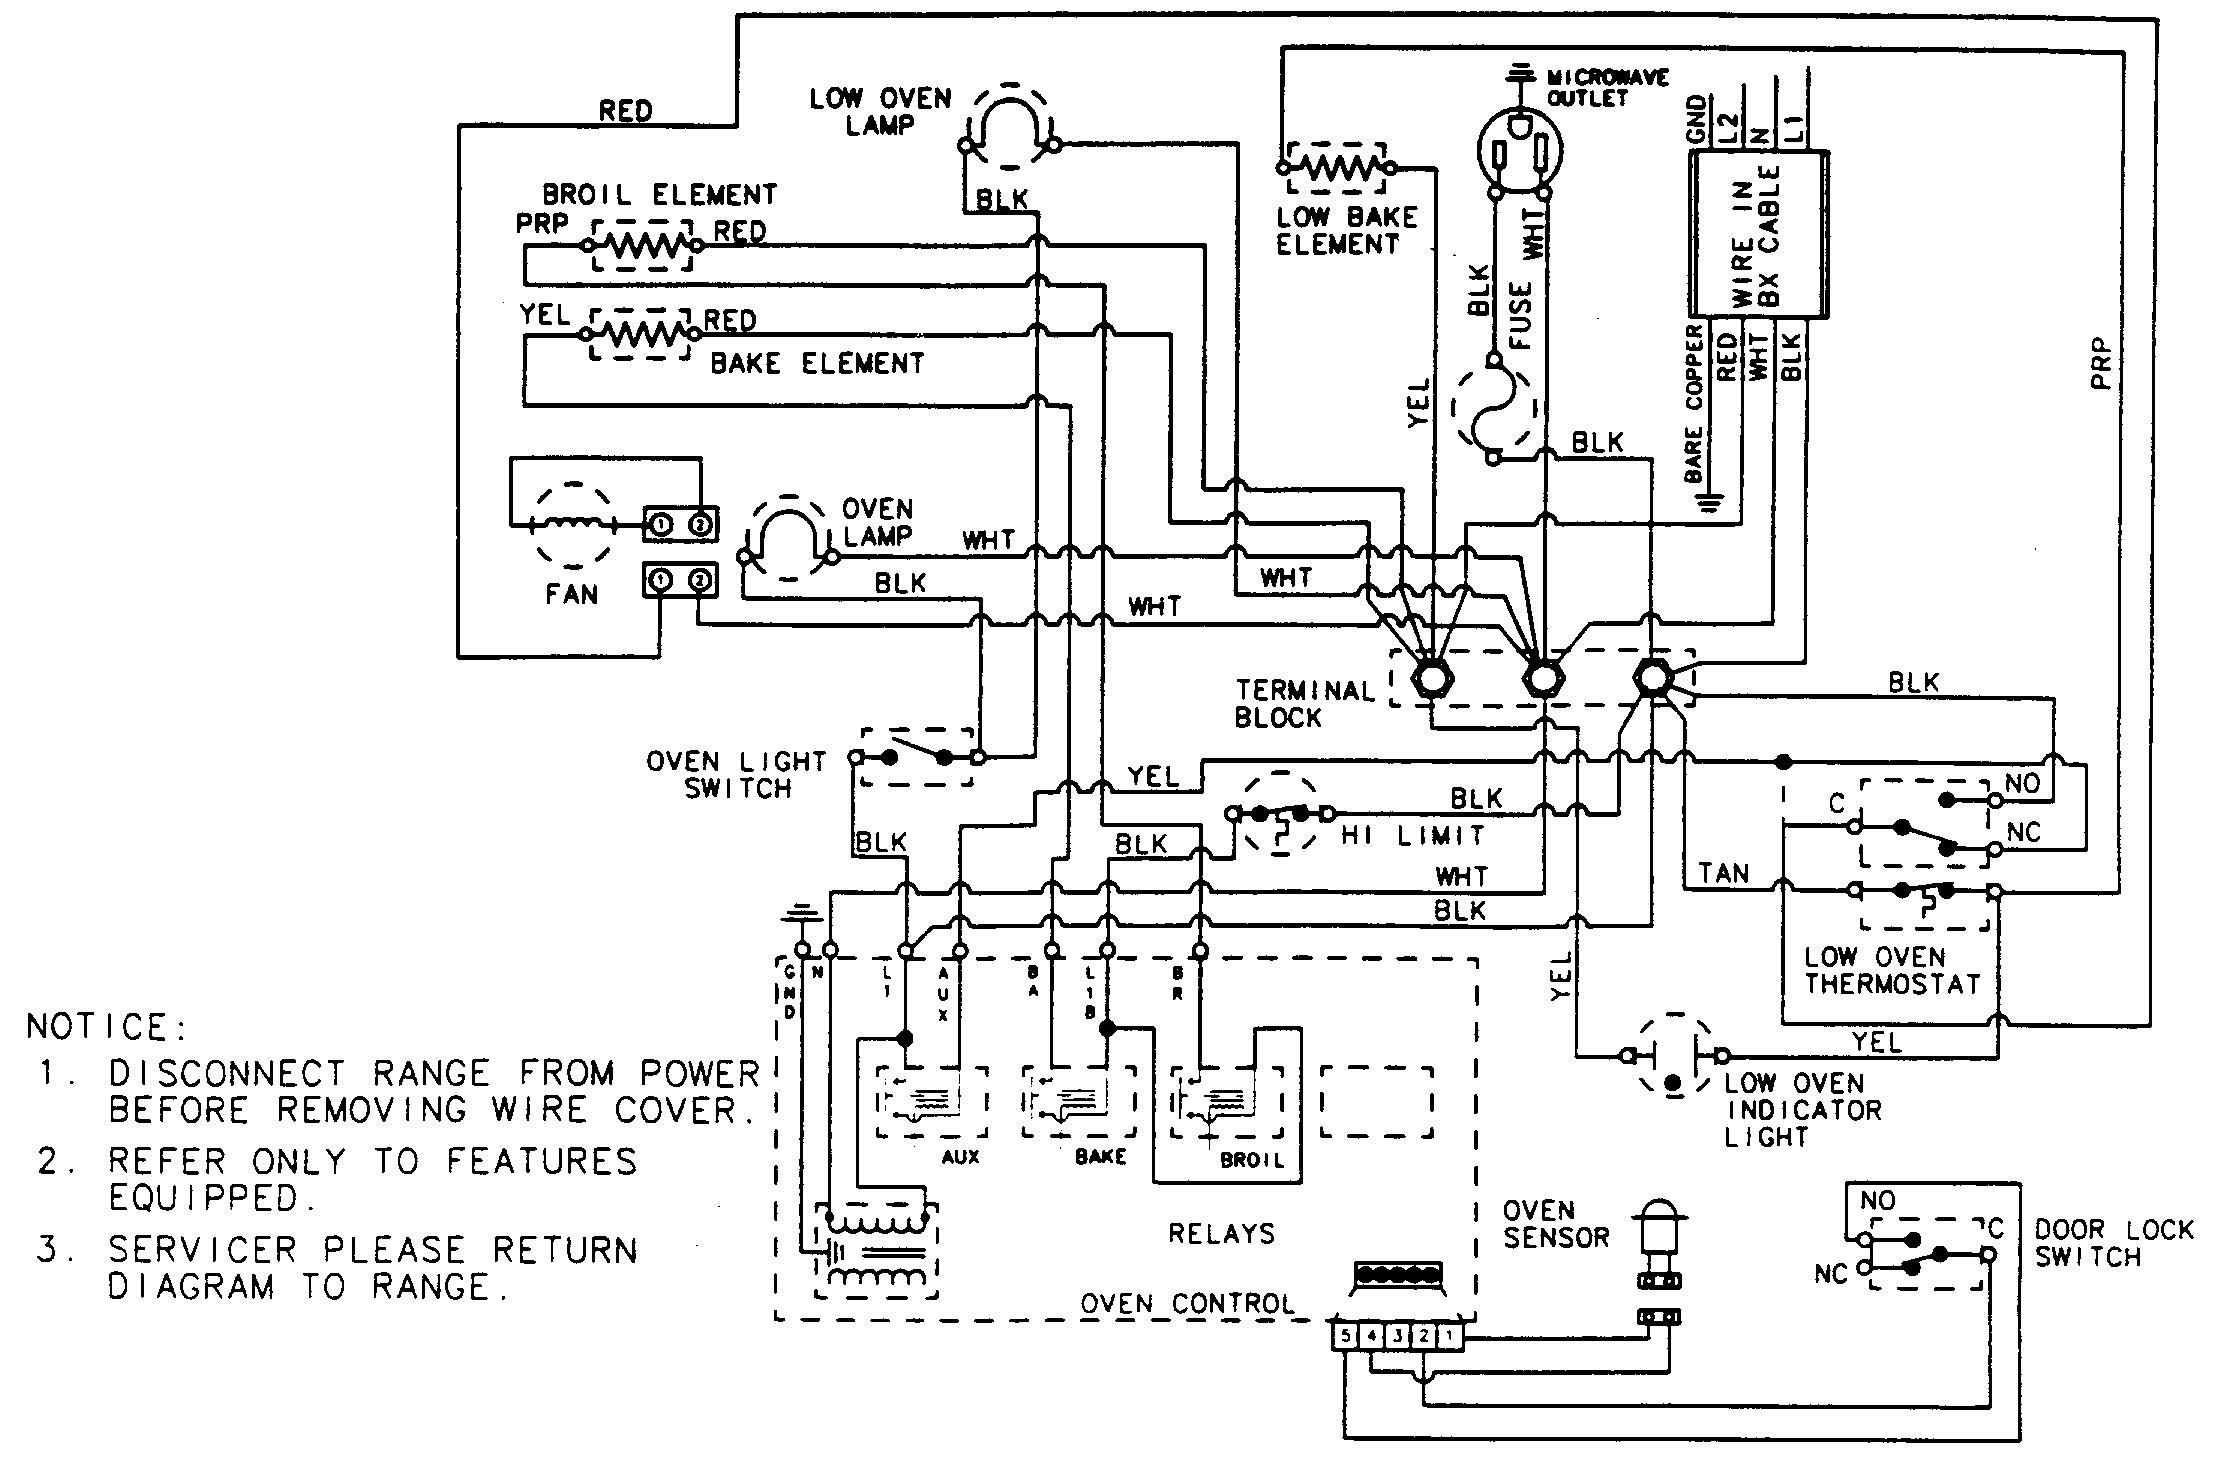 DIAGRAM] Square D Industrial Control Transformer Wiring Diagram FULL  Version HD Quality Wiring Diagram - CBARFSDIAGRAMS.STUDIOTAF.ITstudiotaf.it